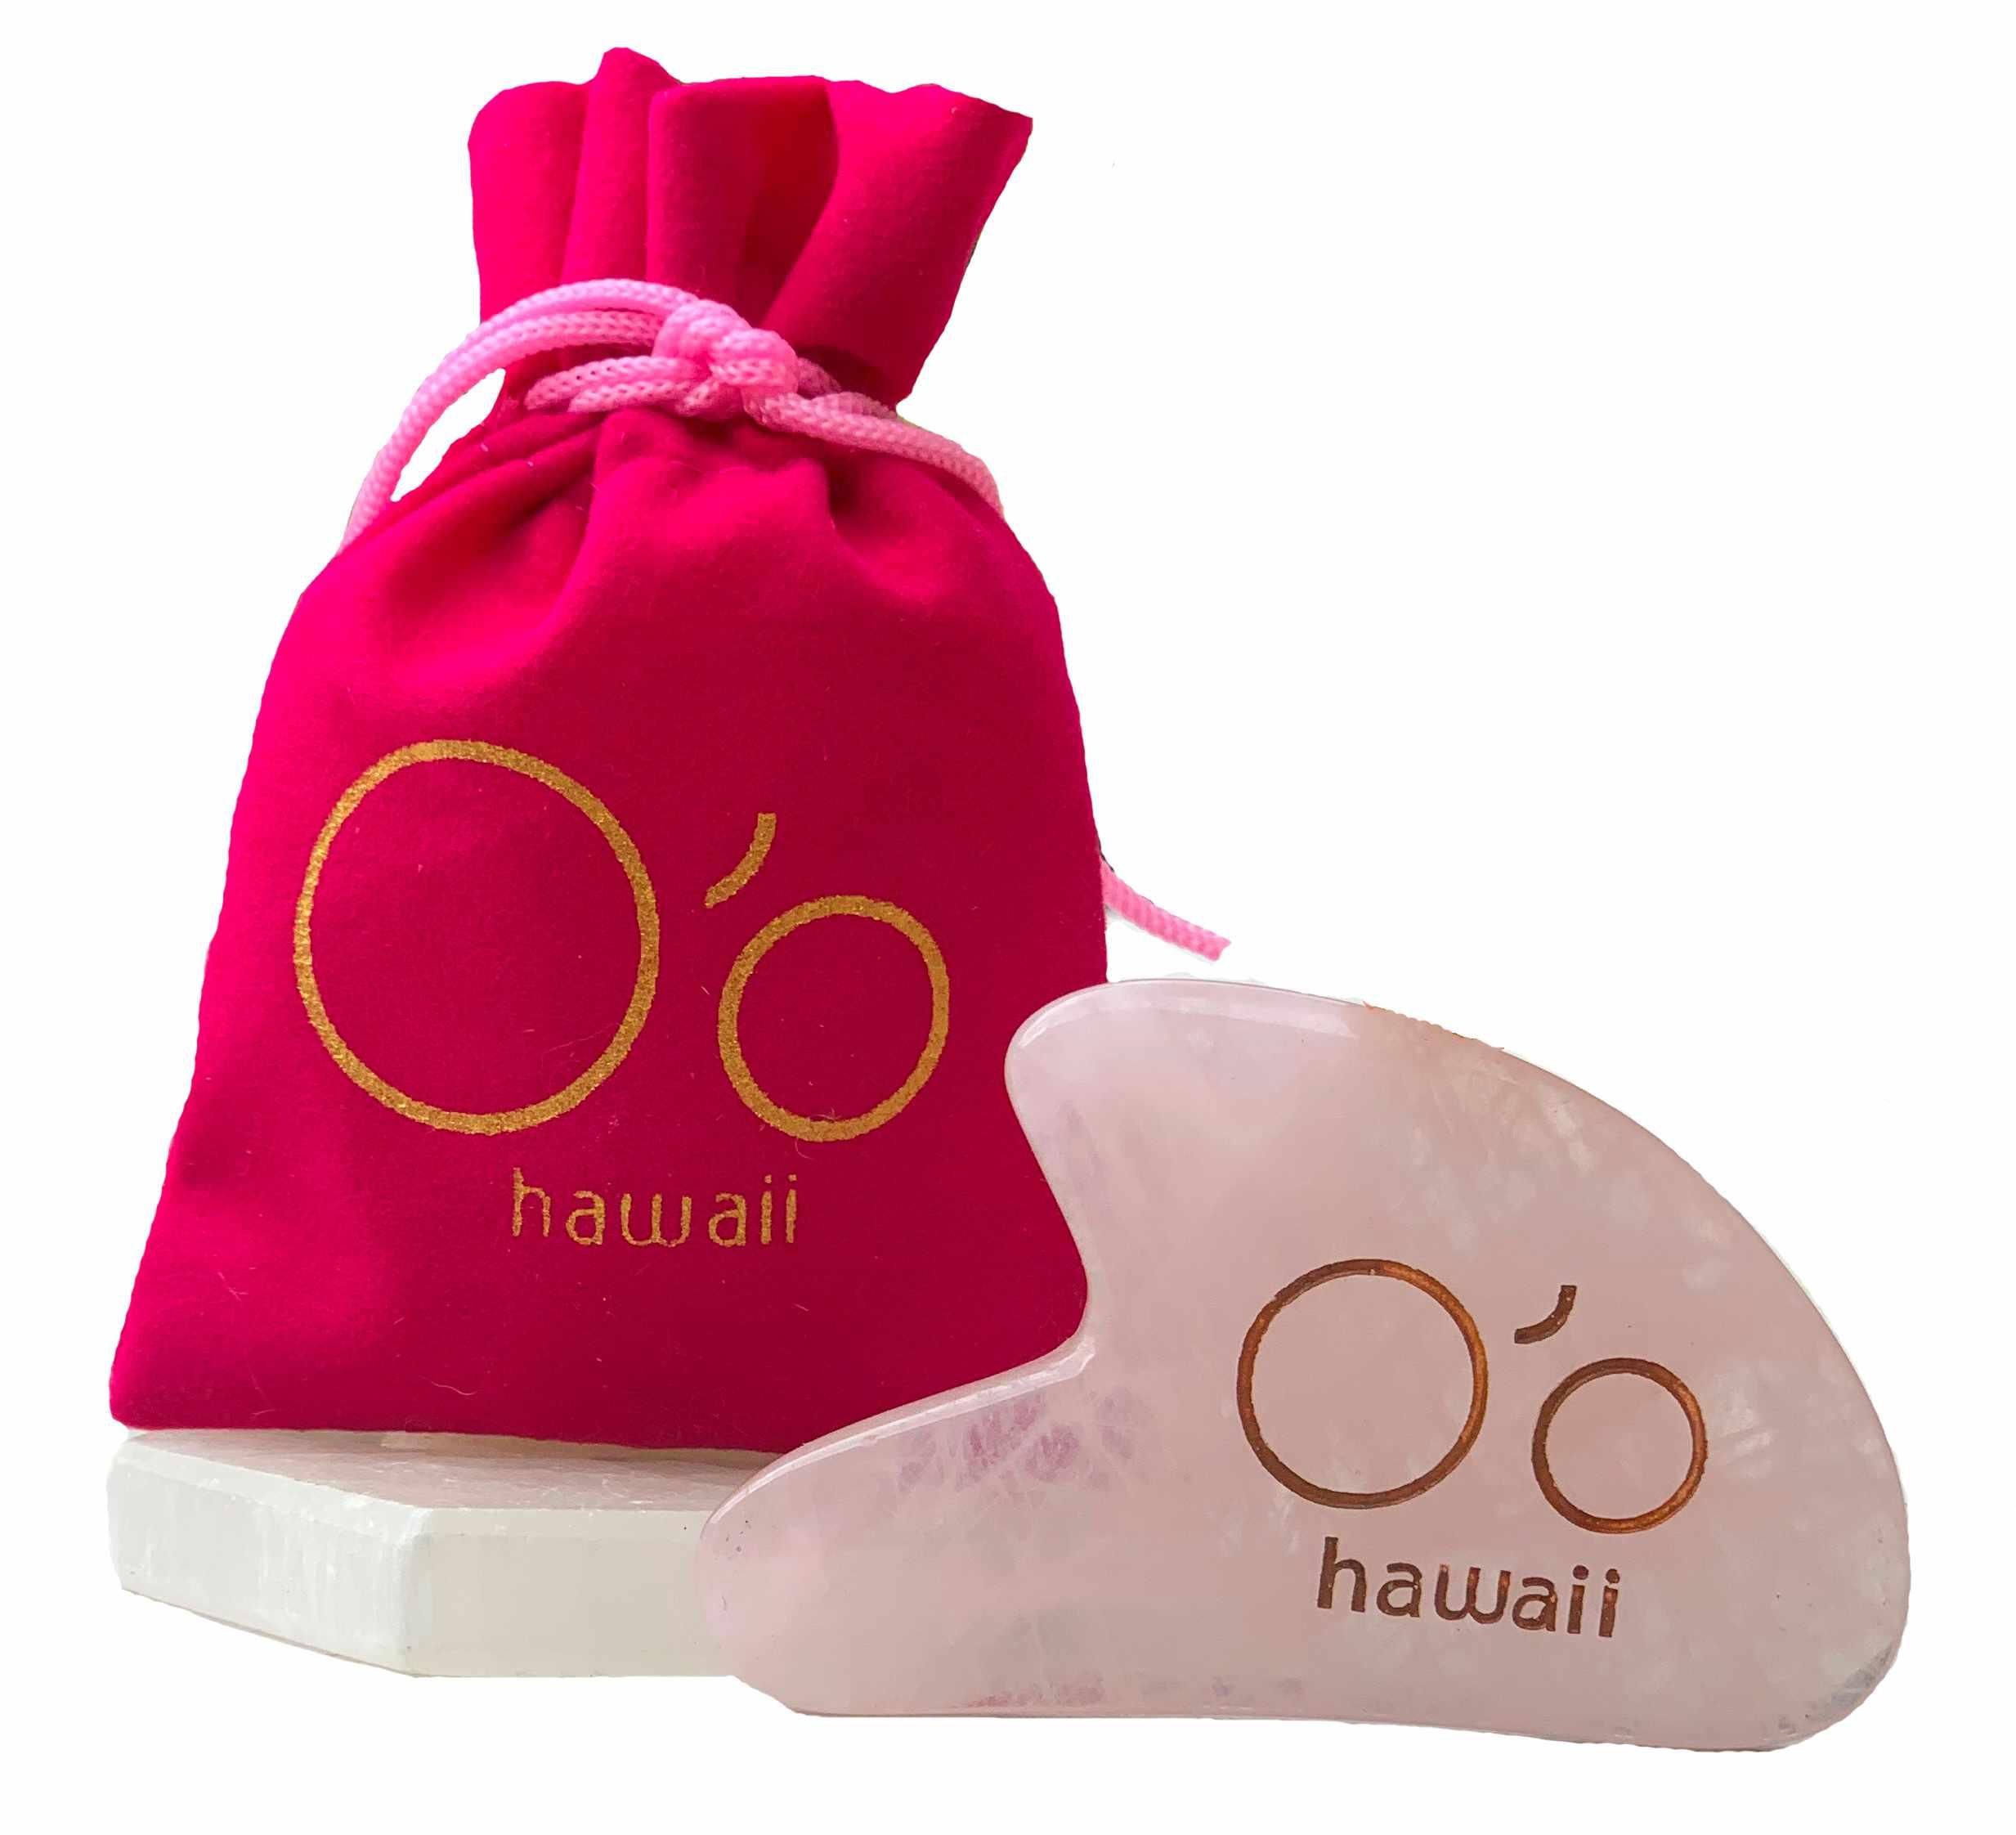 O'o Hawaii Rose Quartz Gua Sha Beauty Tool